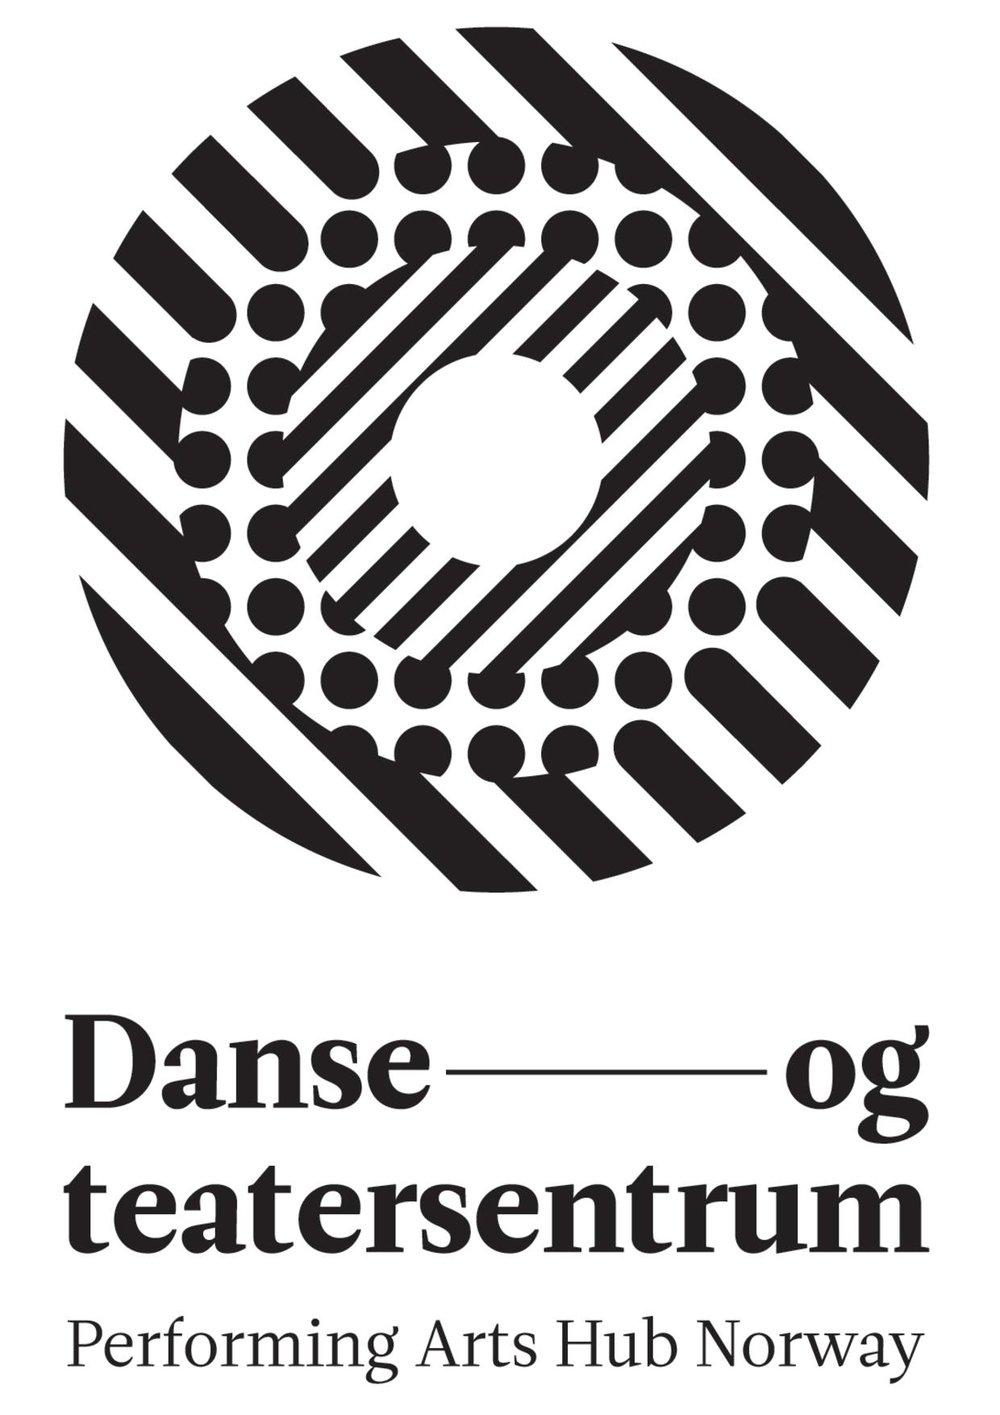 DTS_logo_BW-page-001.jpg